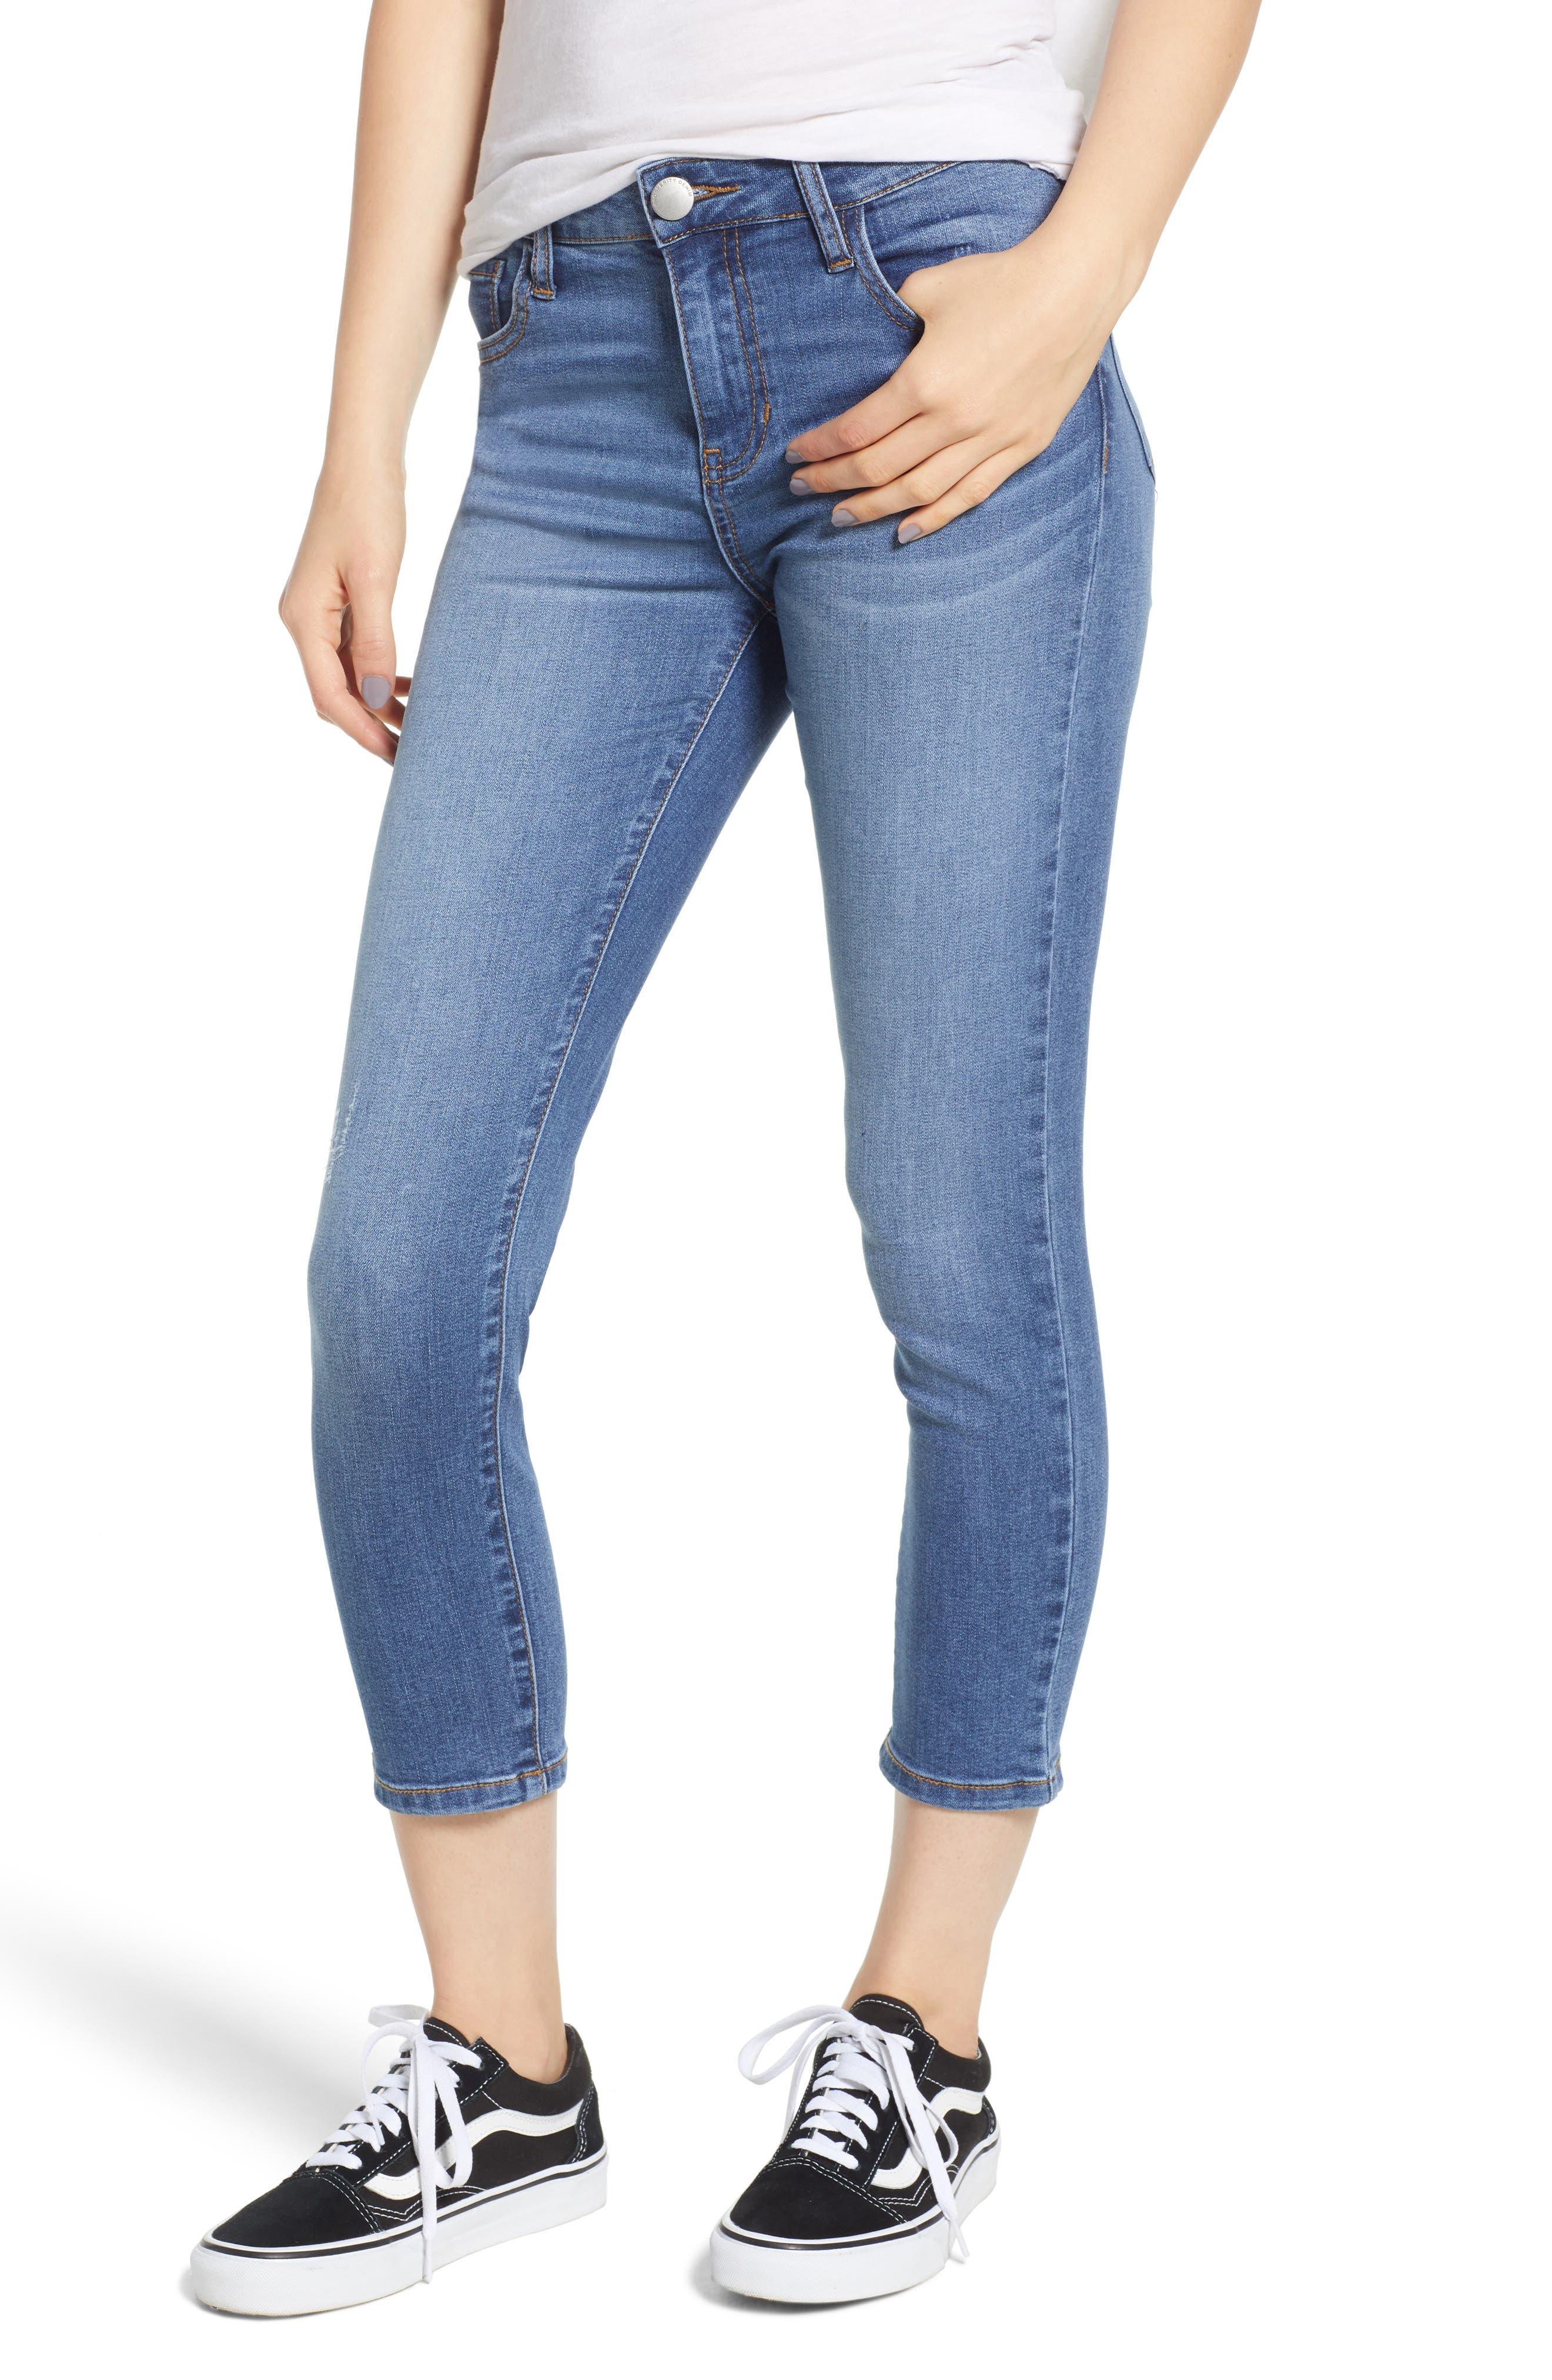 PROSPERITY DENIM, Crop Skinny Jeans, Main thumbnail 1, color, MEDIUM WASH